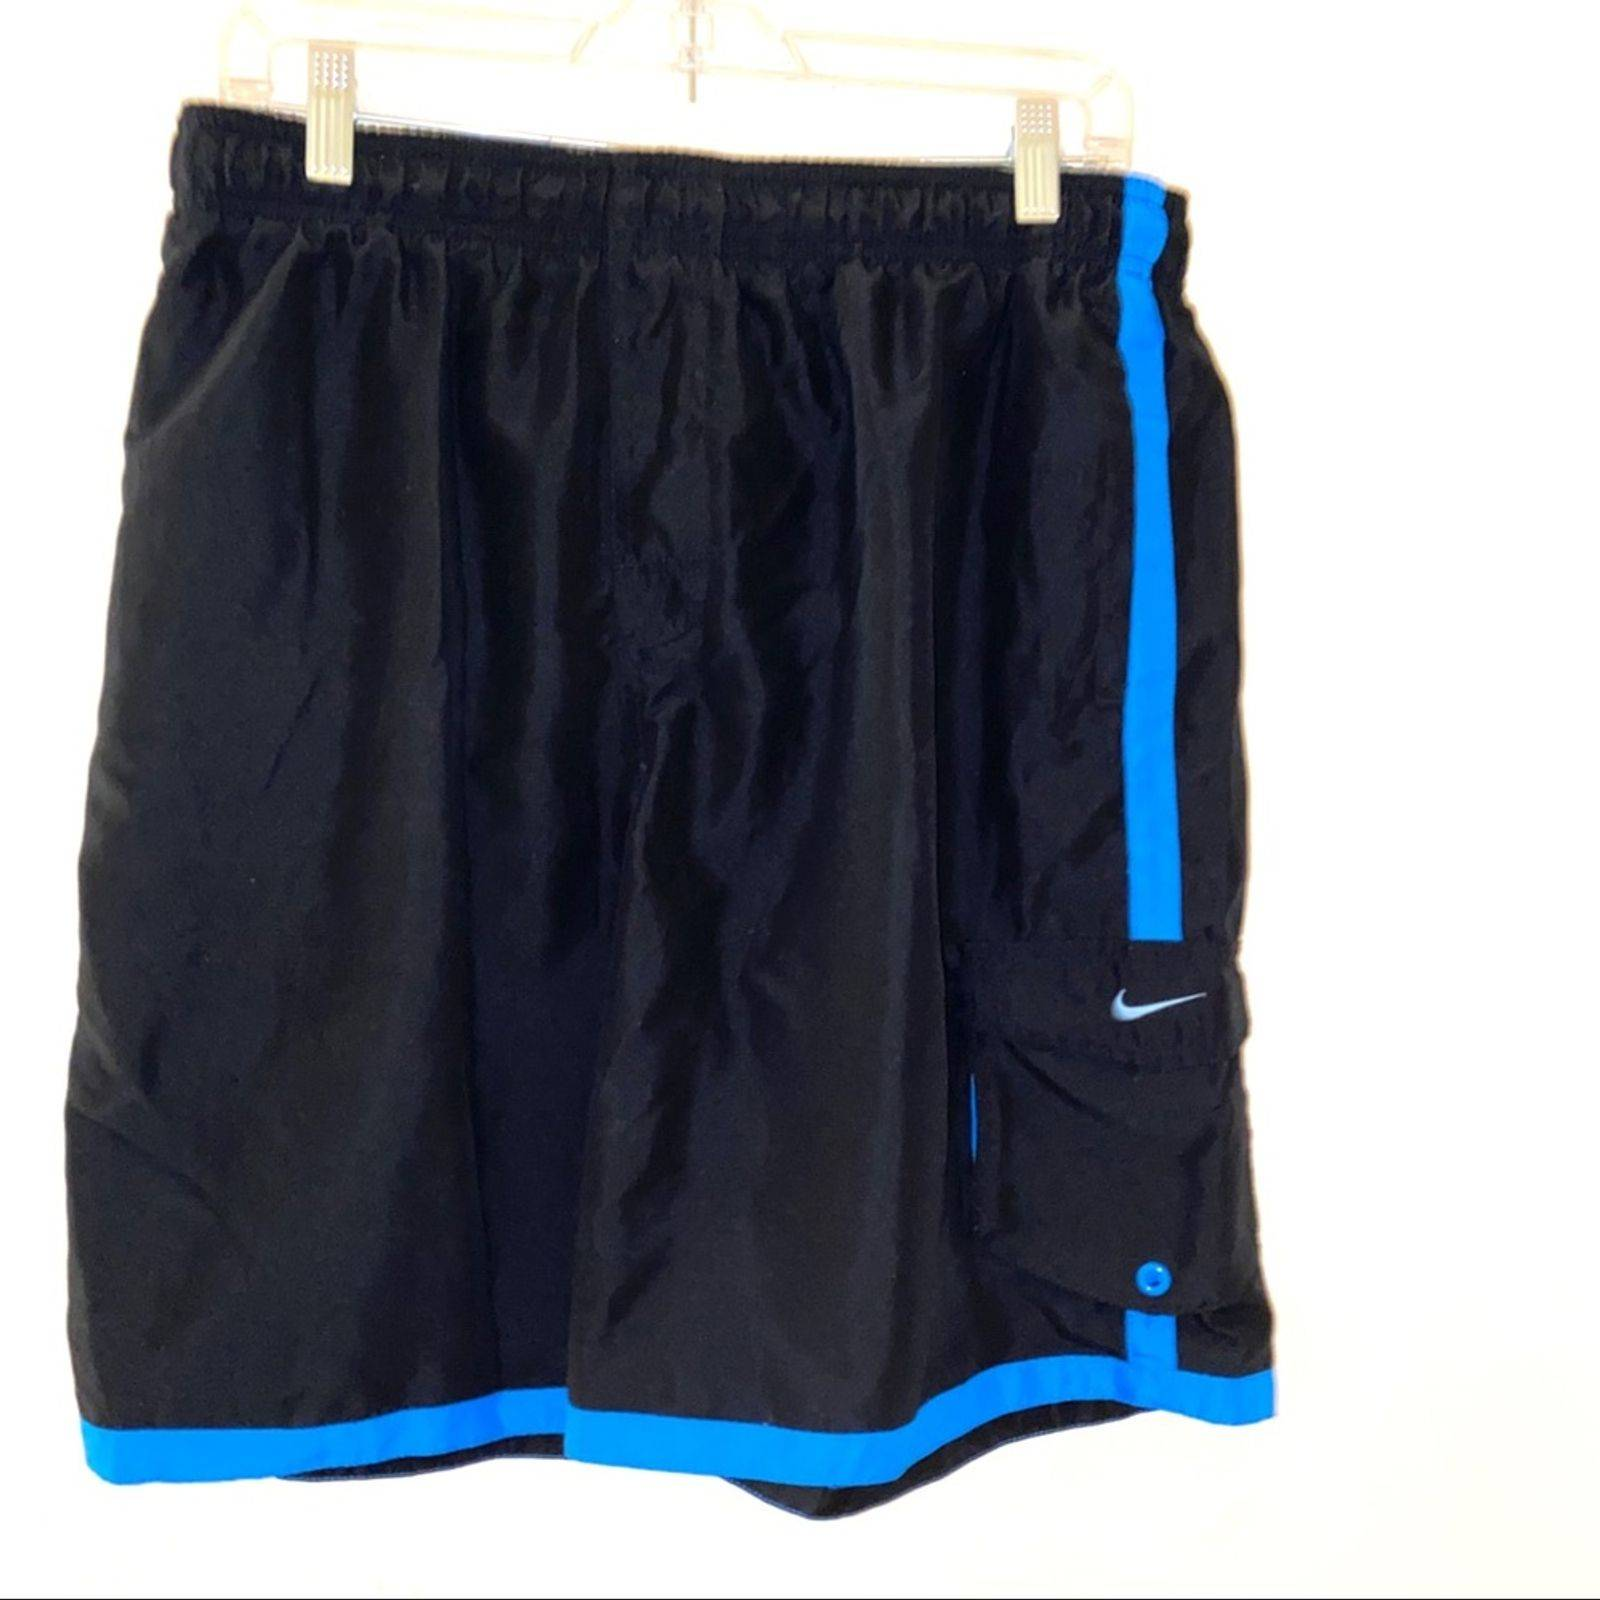 Nike mens swim trunks S black  shorts